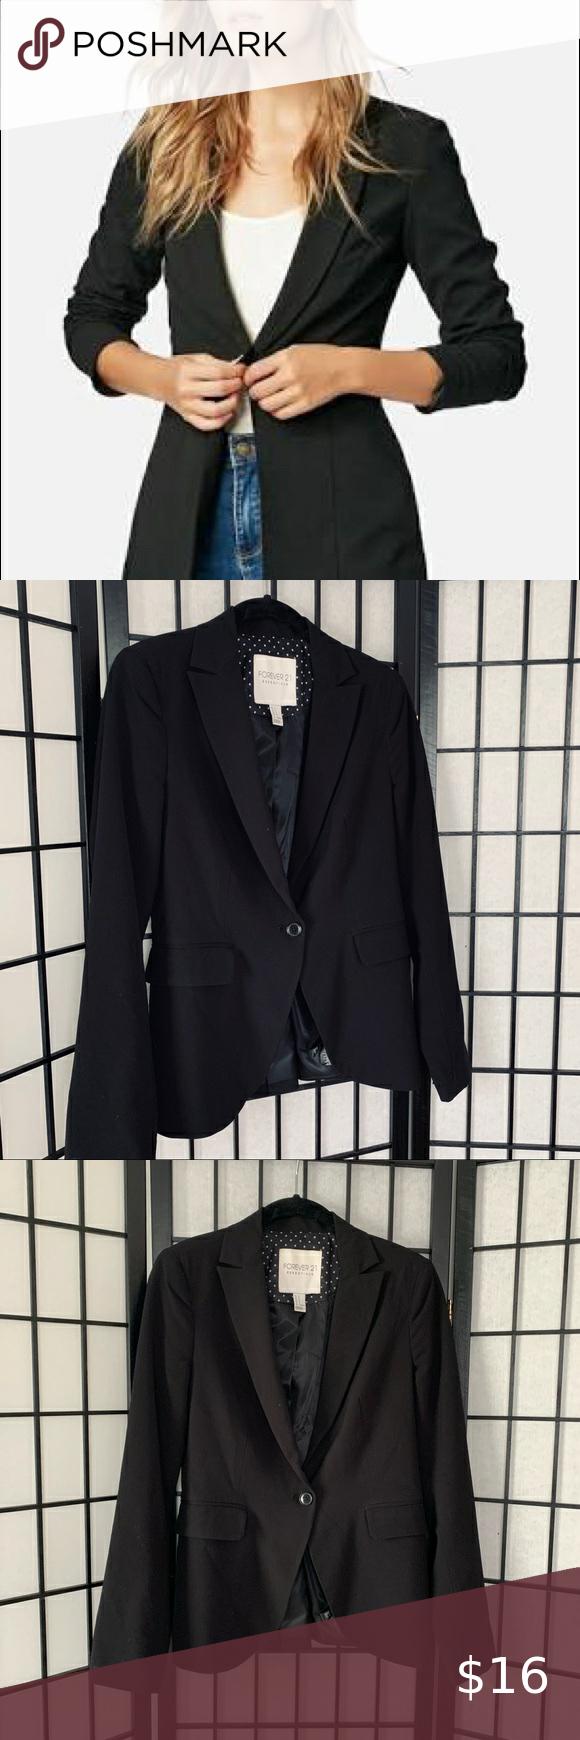 Women S Black Professional Blazer Jacket Professional Blazers Blazer Jackets [ 1740 x 580 Pixel ]